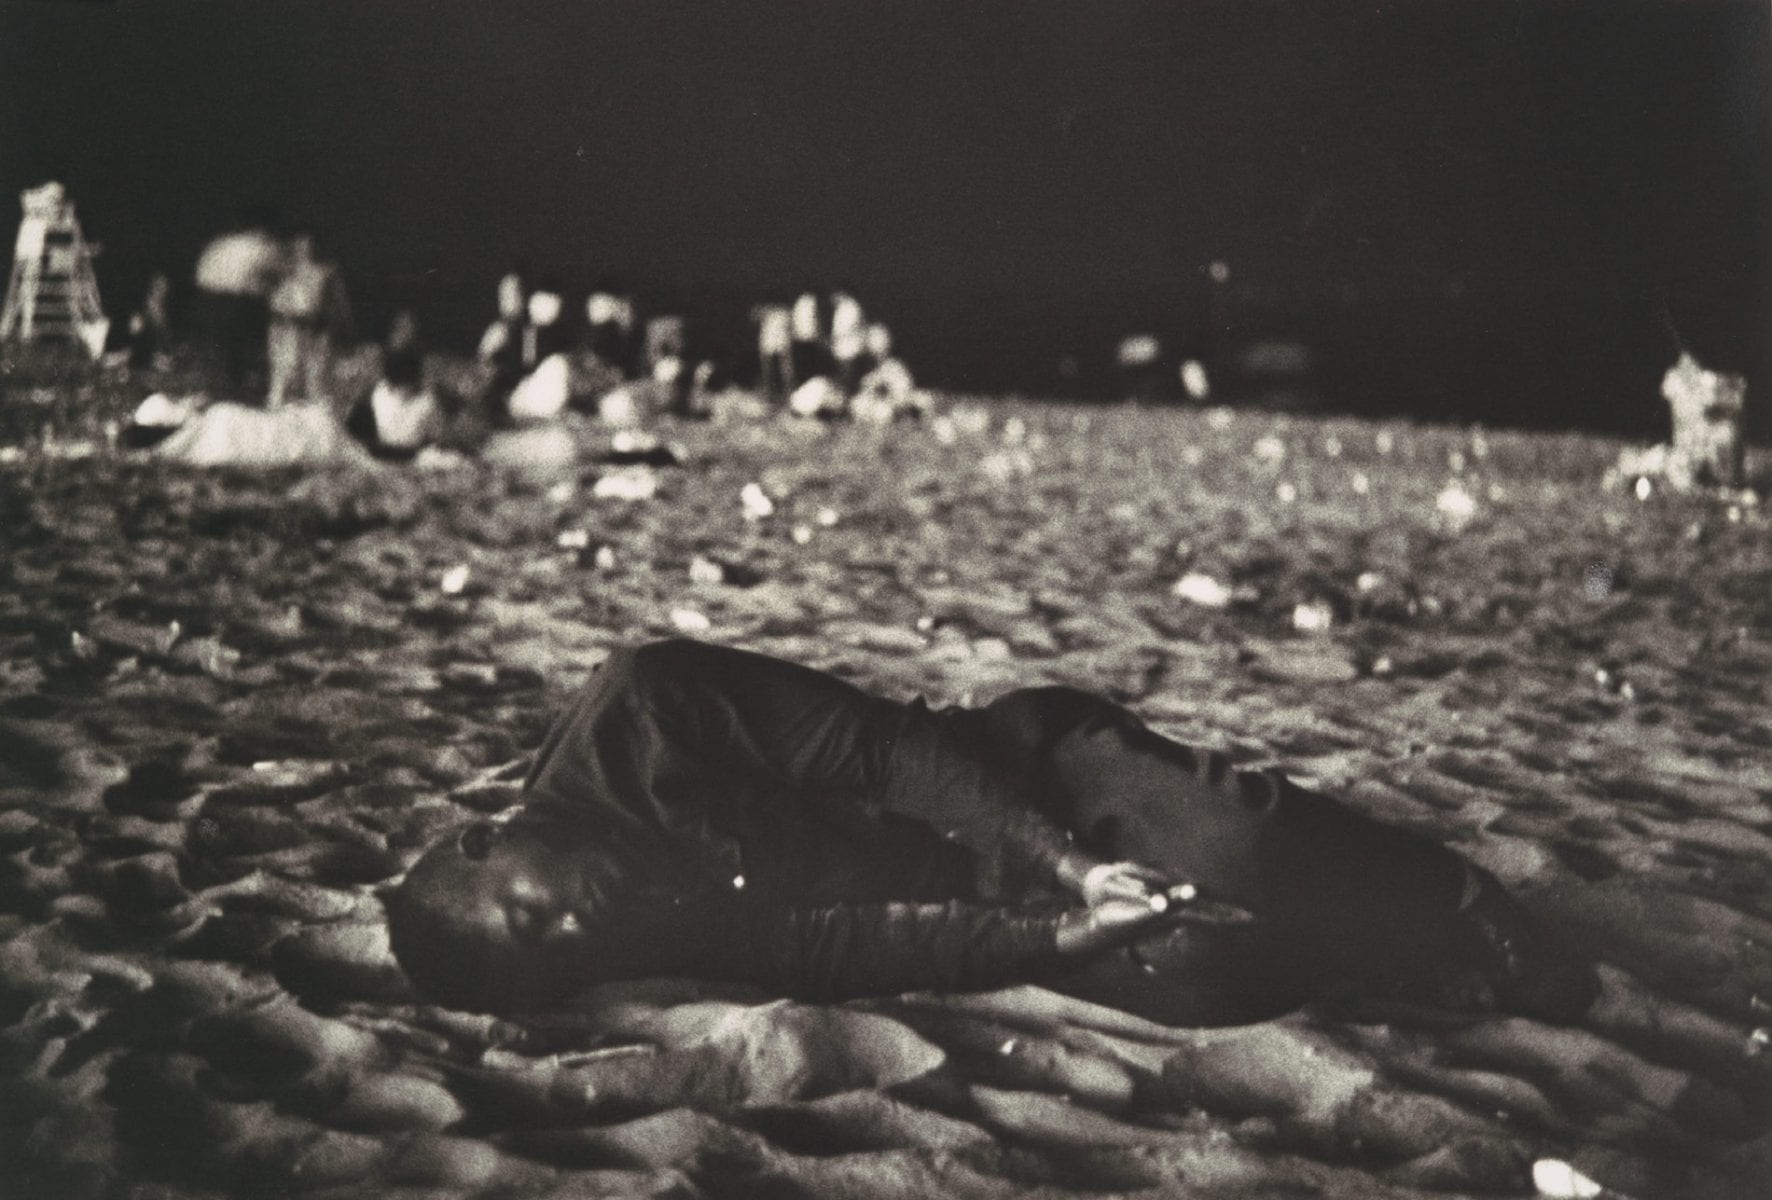 Black & White 1958 juillet, Coney Island, USA, XNUMX © Robert Frank Photographie et rêves